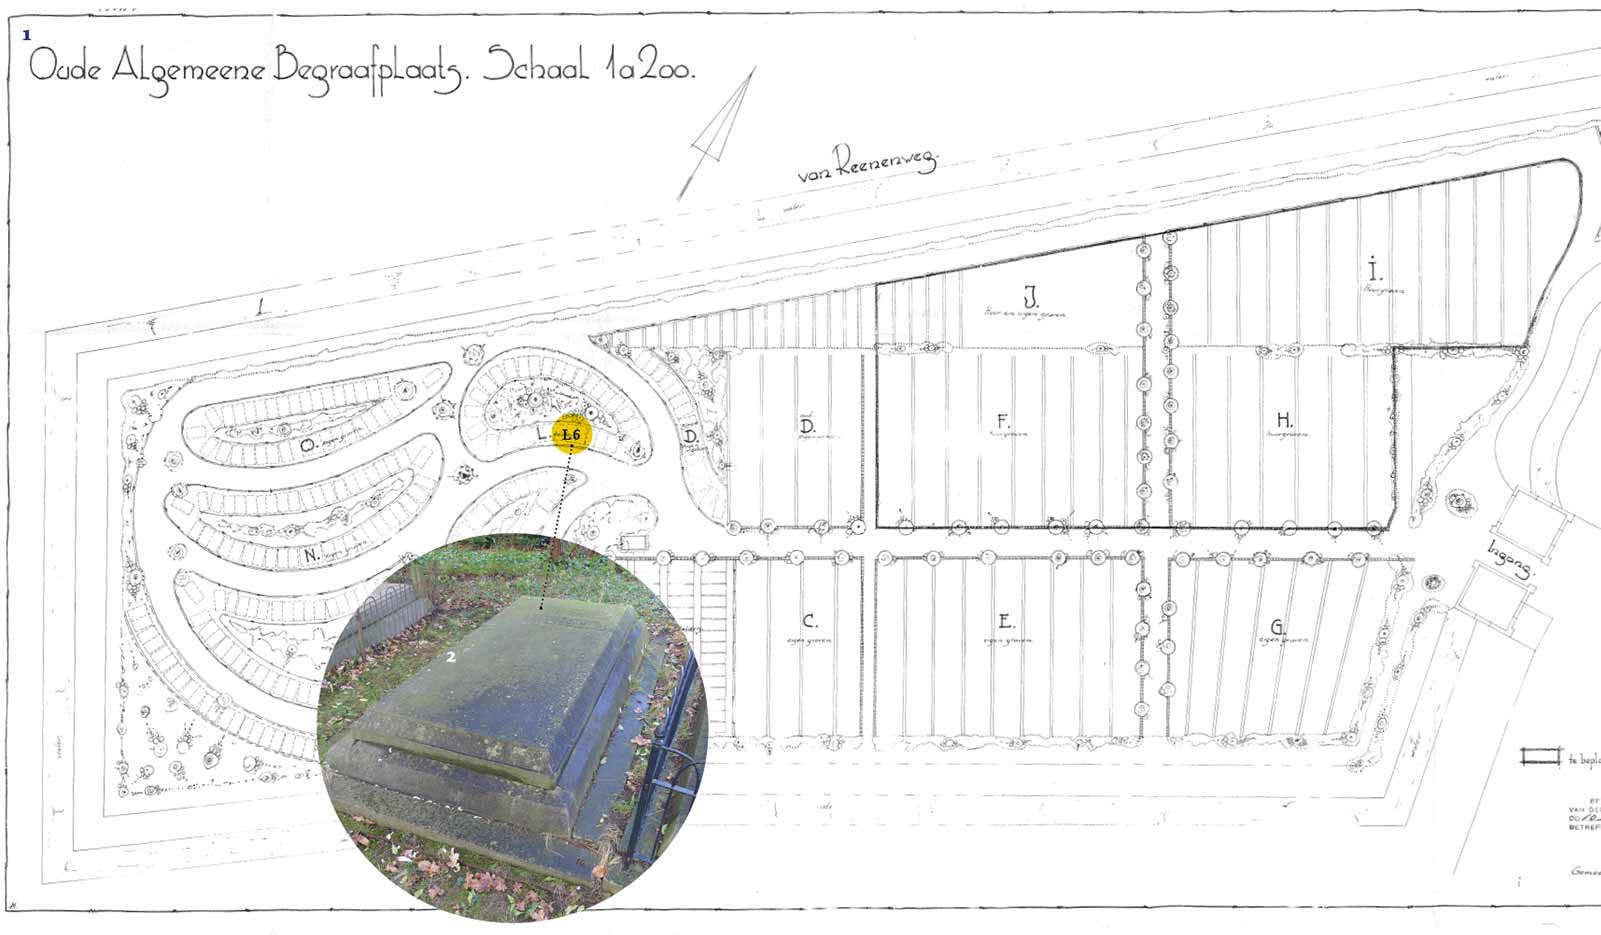 Ligging graf L6 Walkart - Plattegrond Oude Algemene Begraafplaats